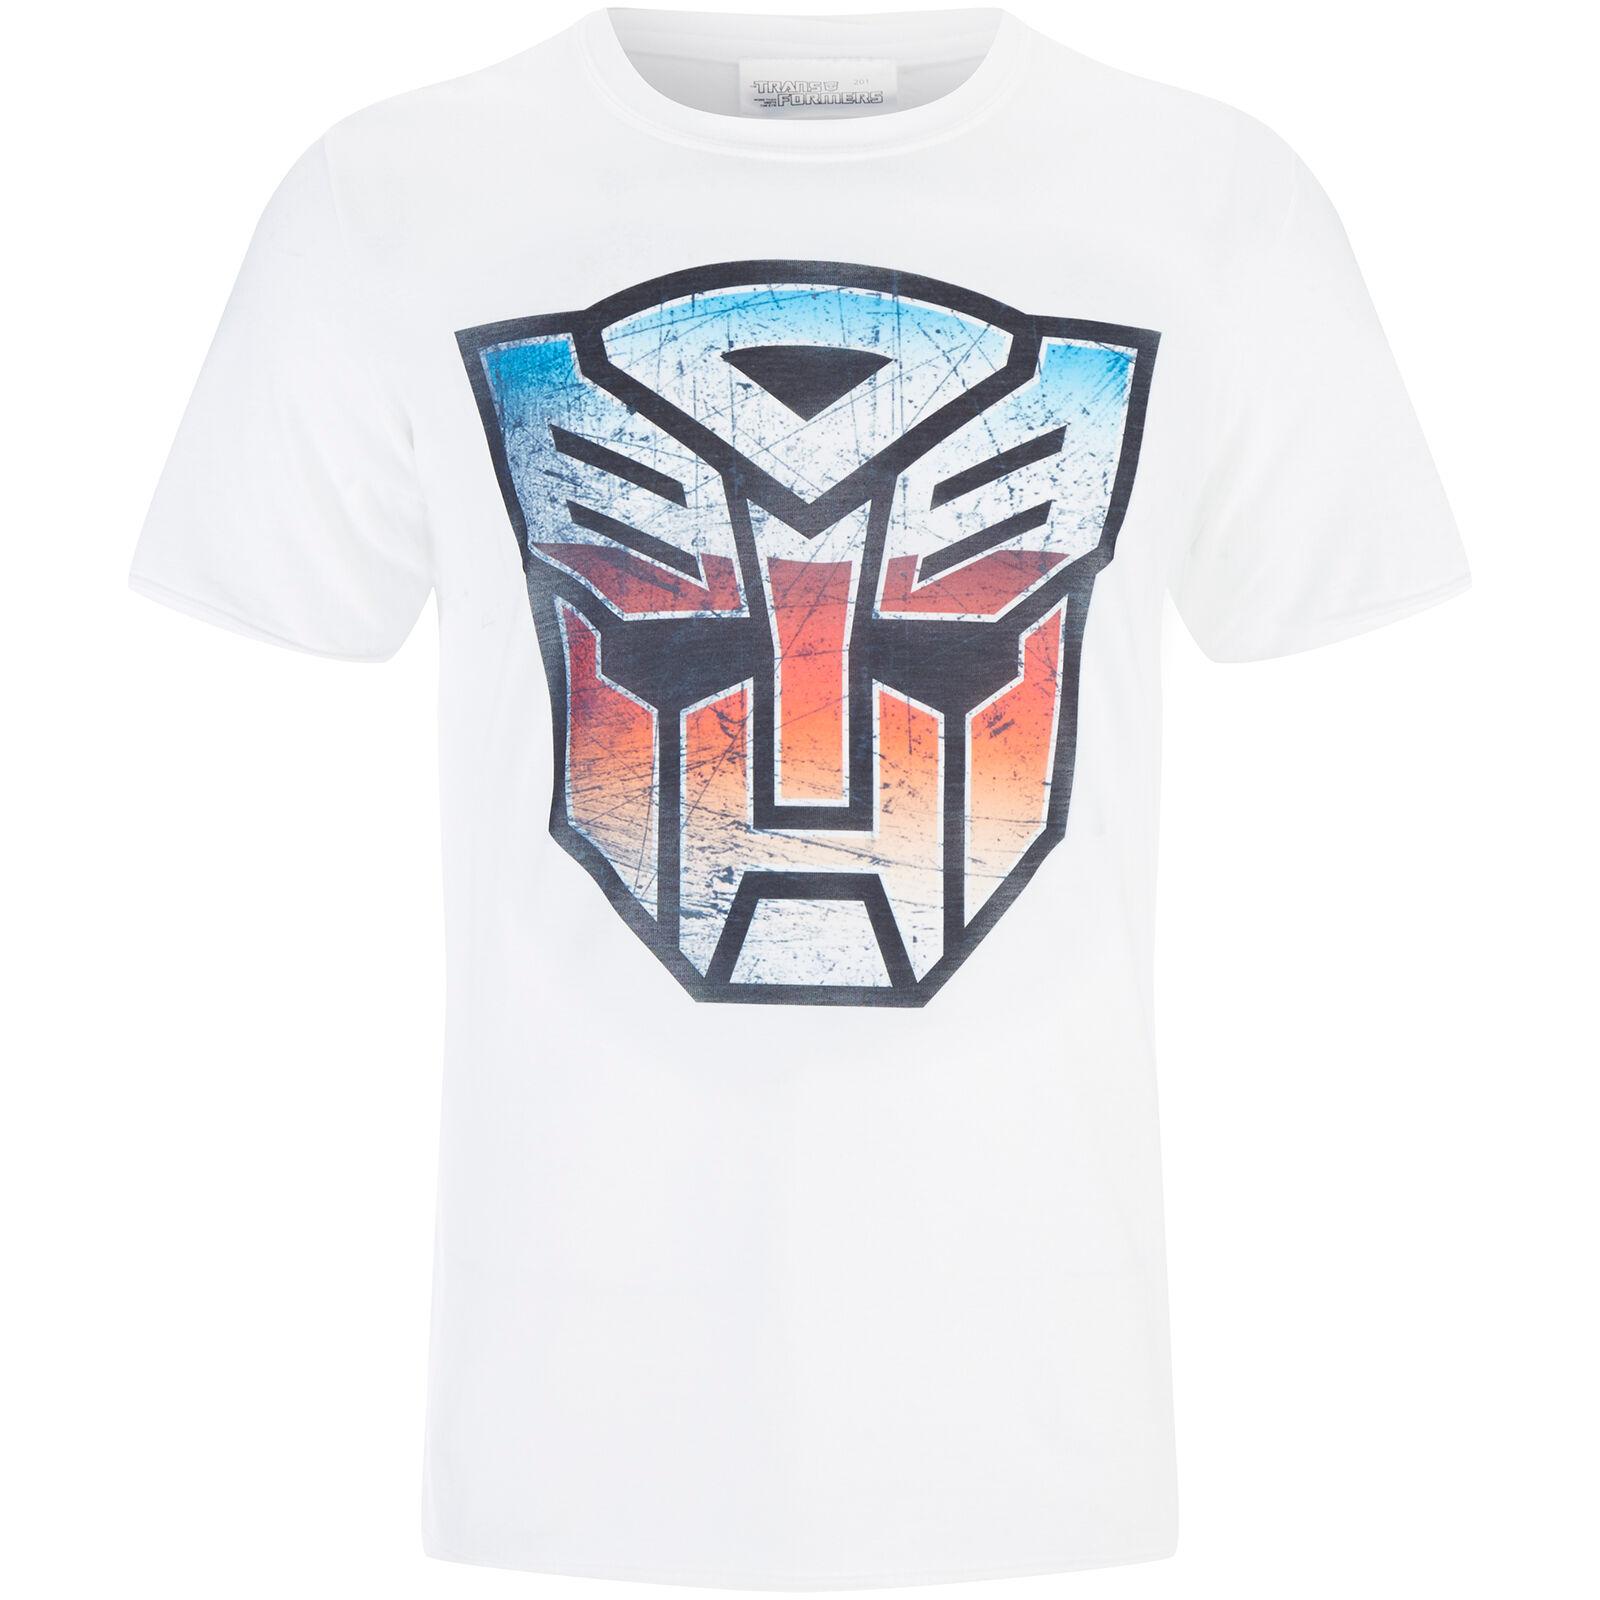 Geek Clothing Transformers Men's Transformers Multi Emblem T-Shirt - White - L - White